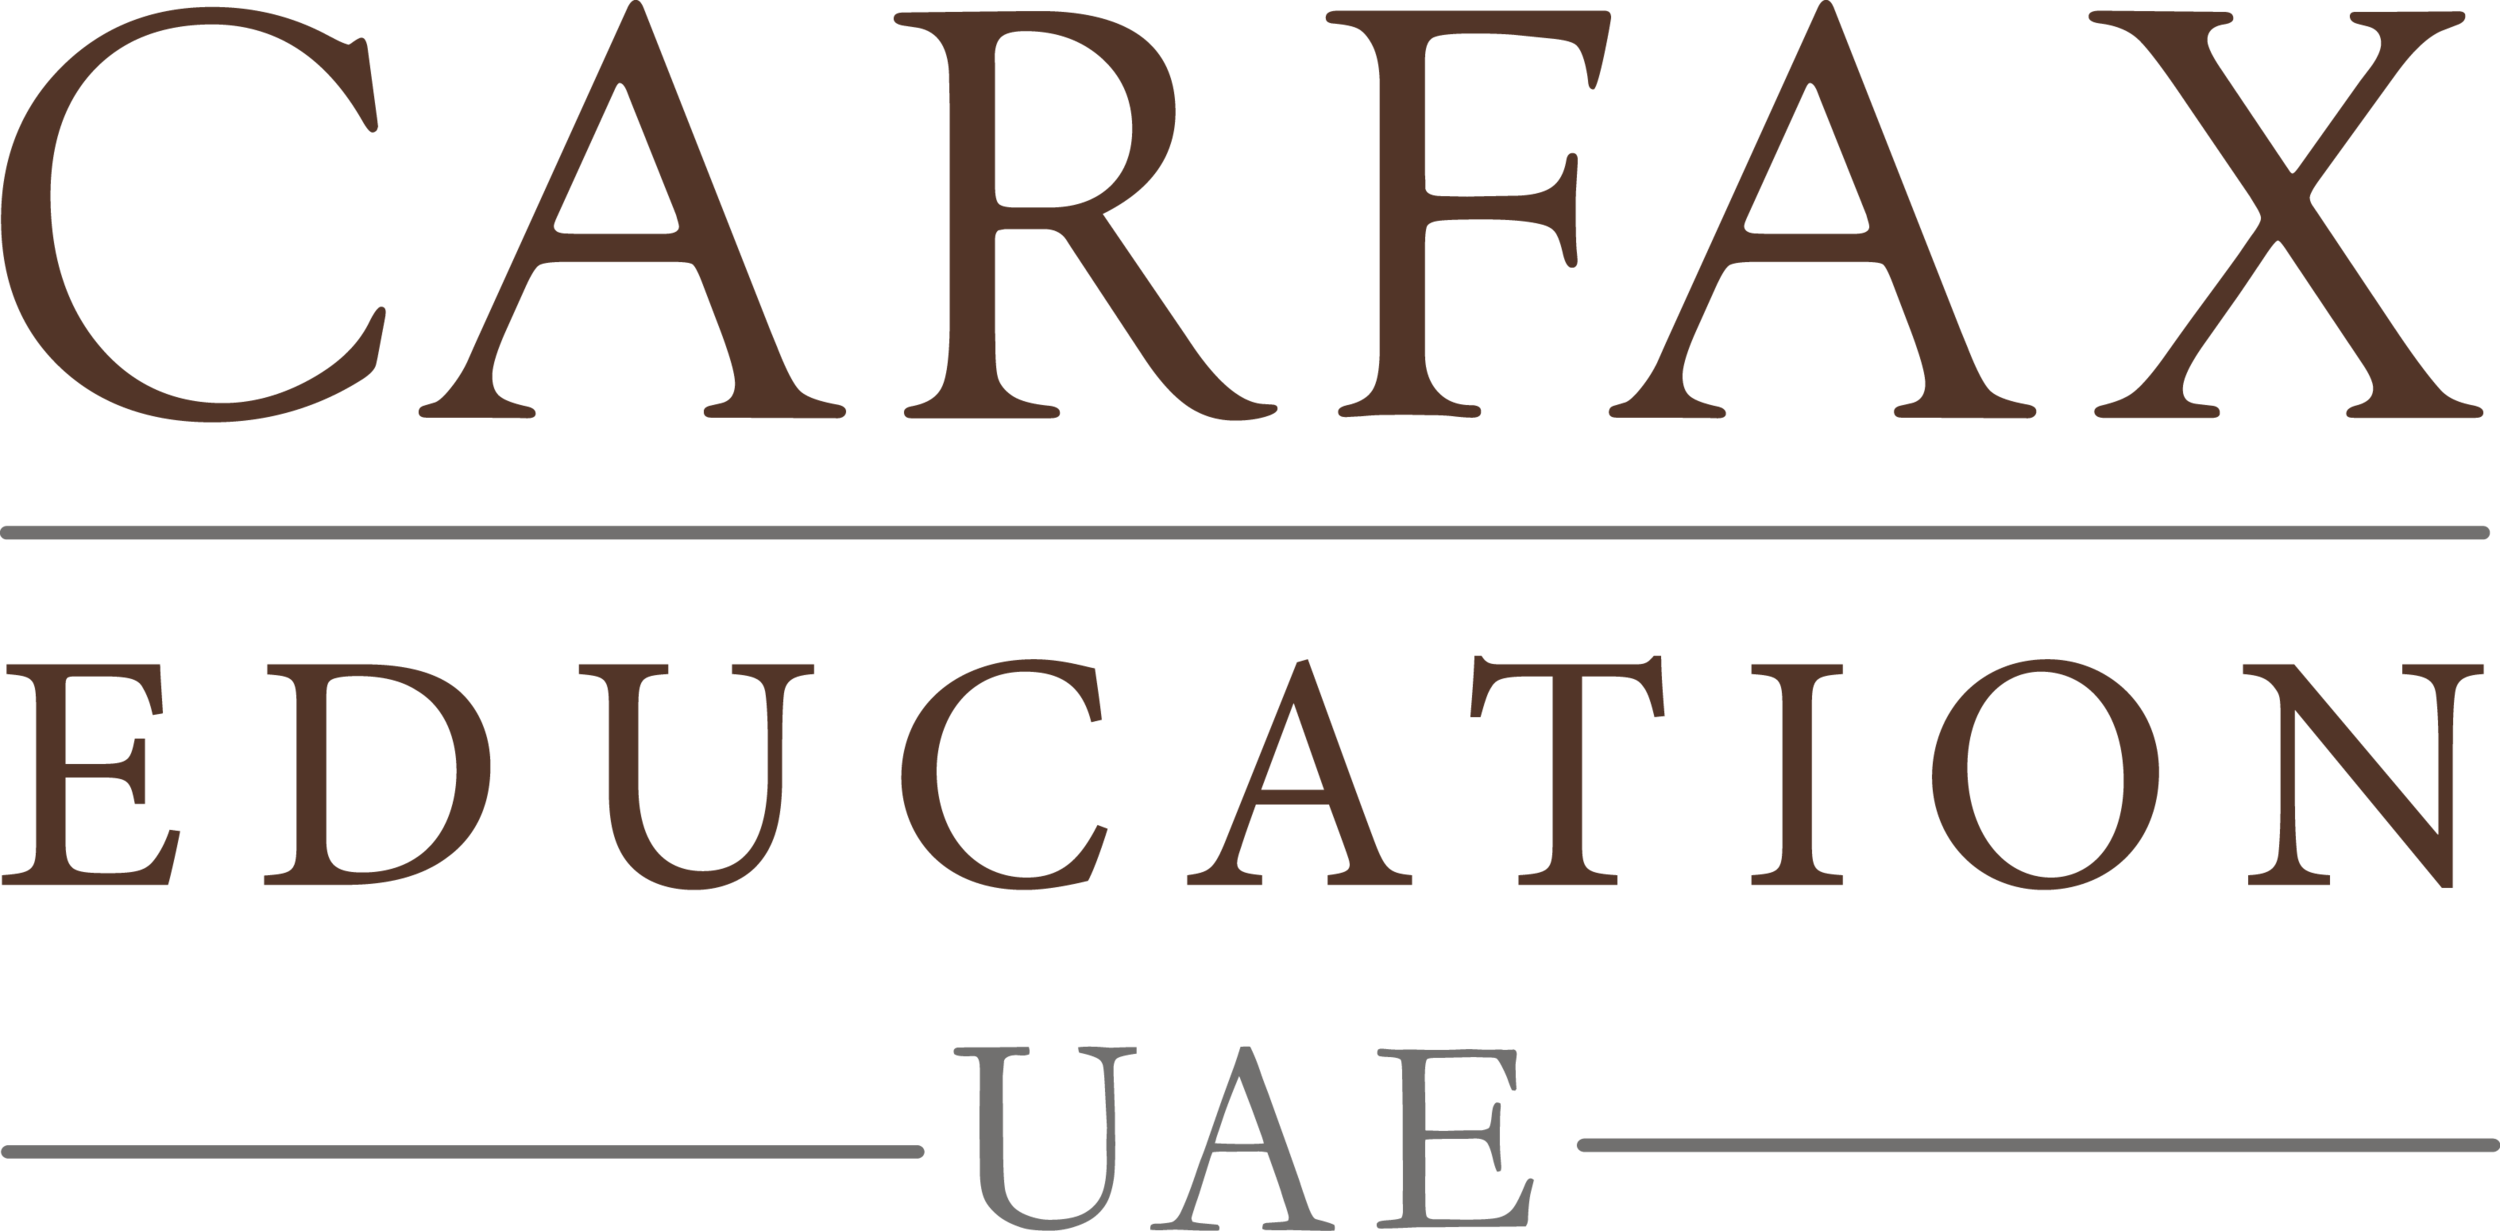 Carfax UAE New Logo.png